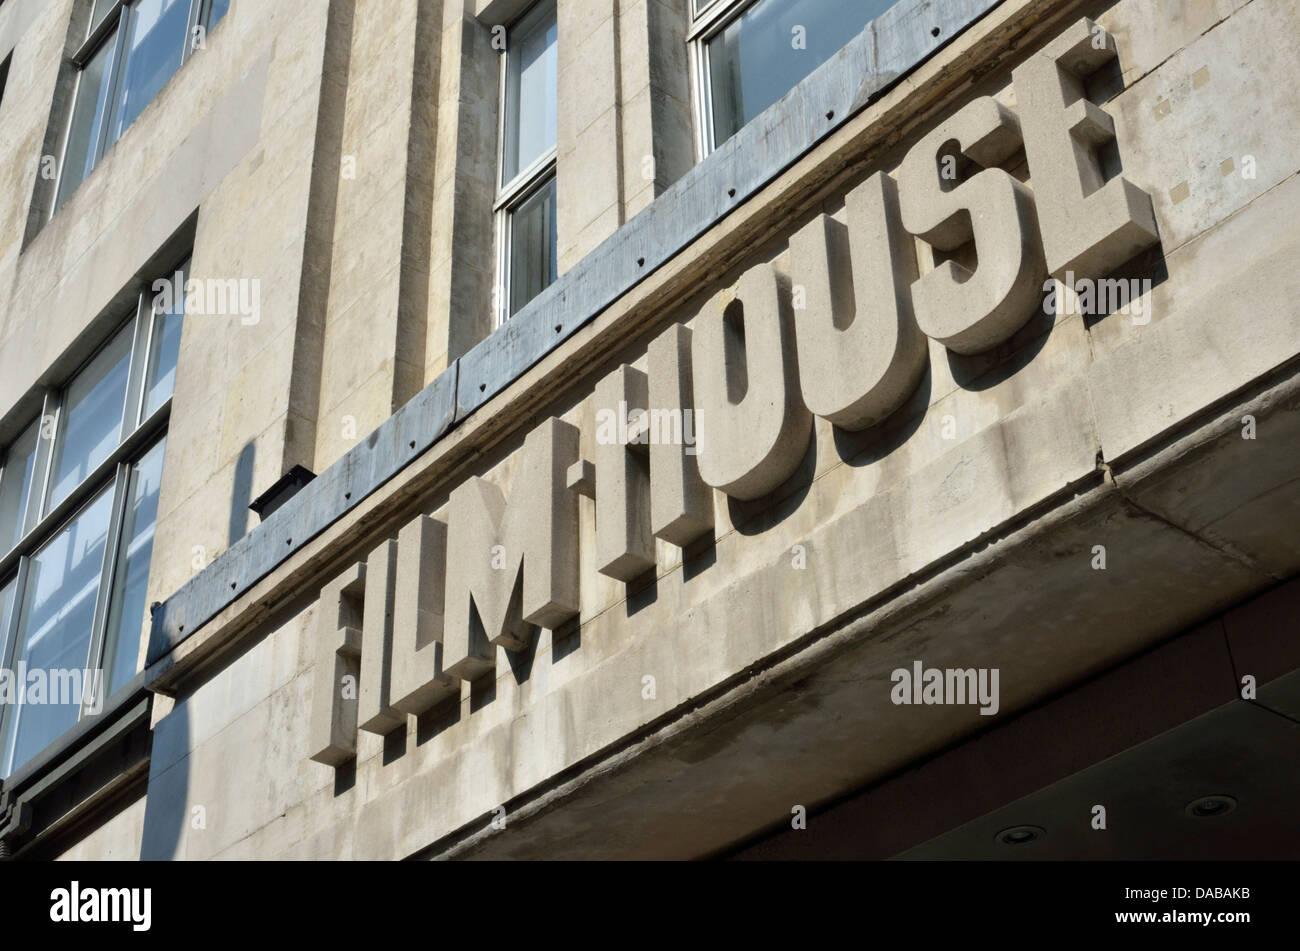 Film House in Wardour Street, Soho, London, UK. - Stock Image